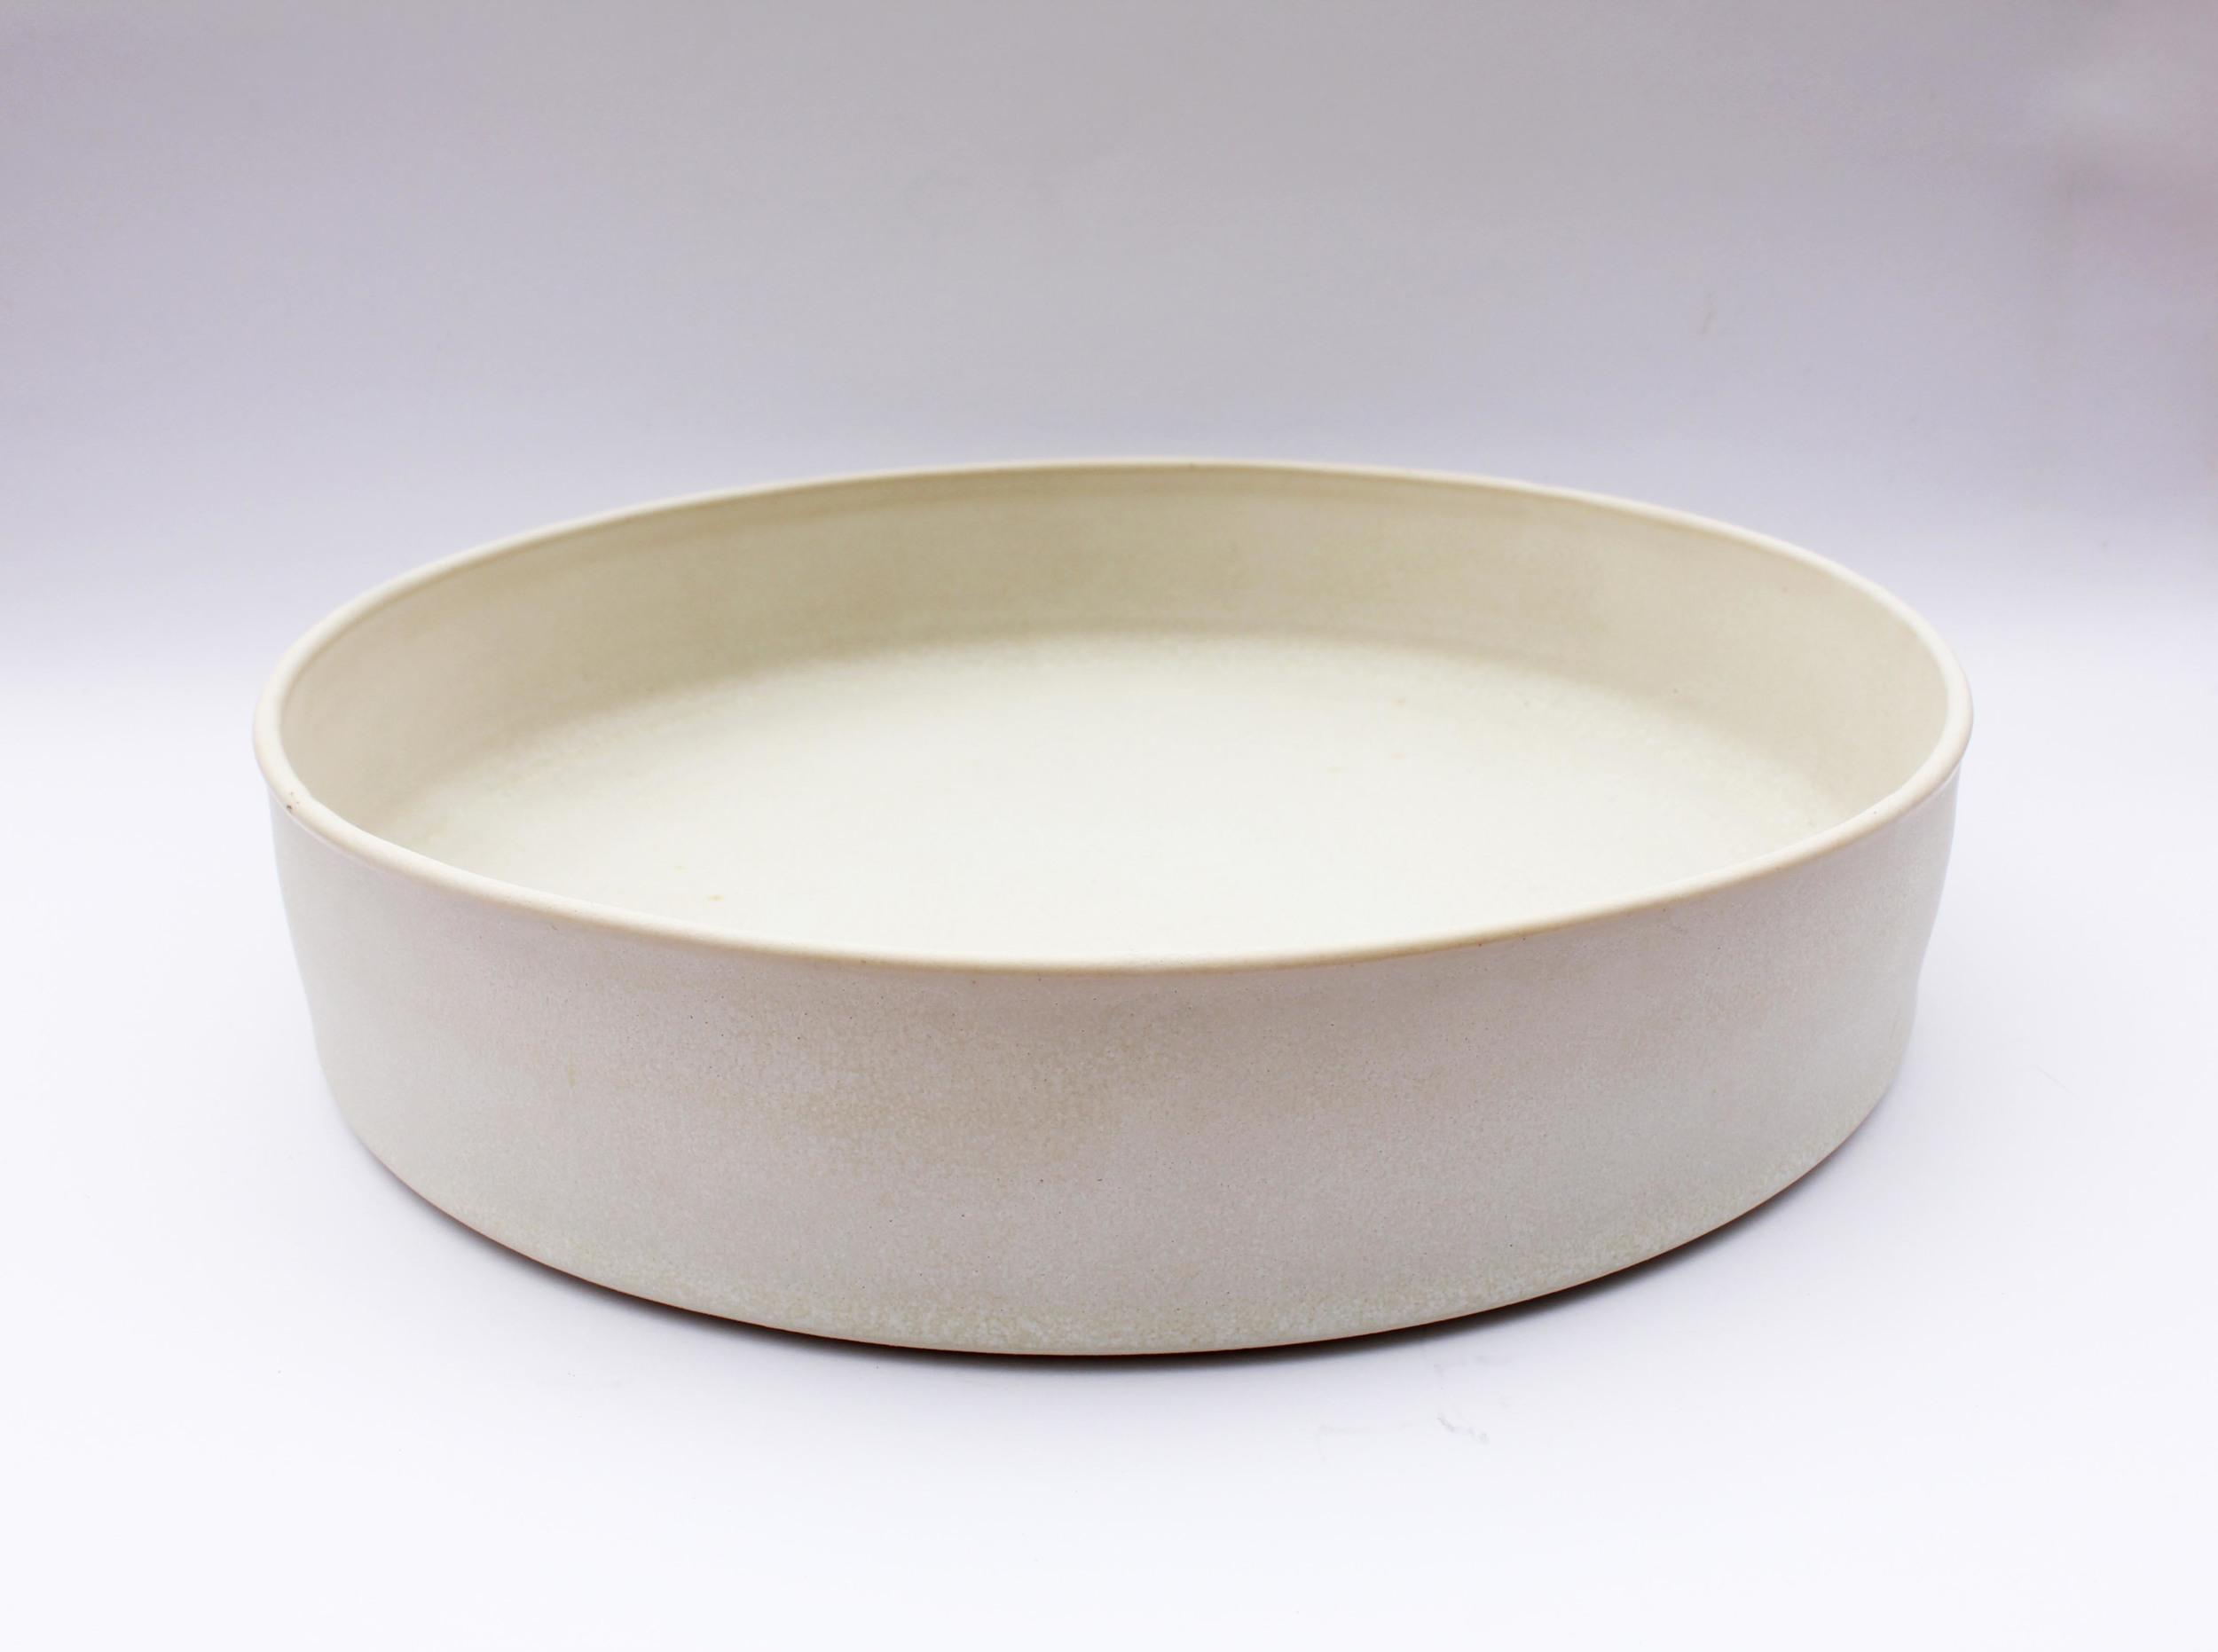 potato salad bowl.jpg